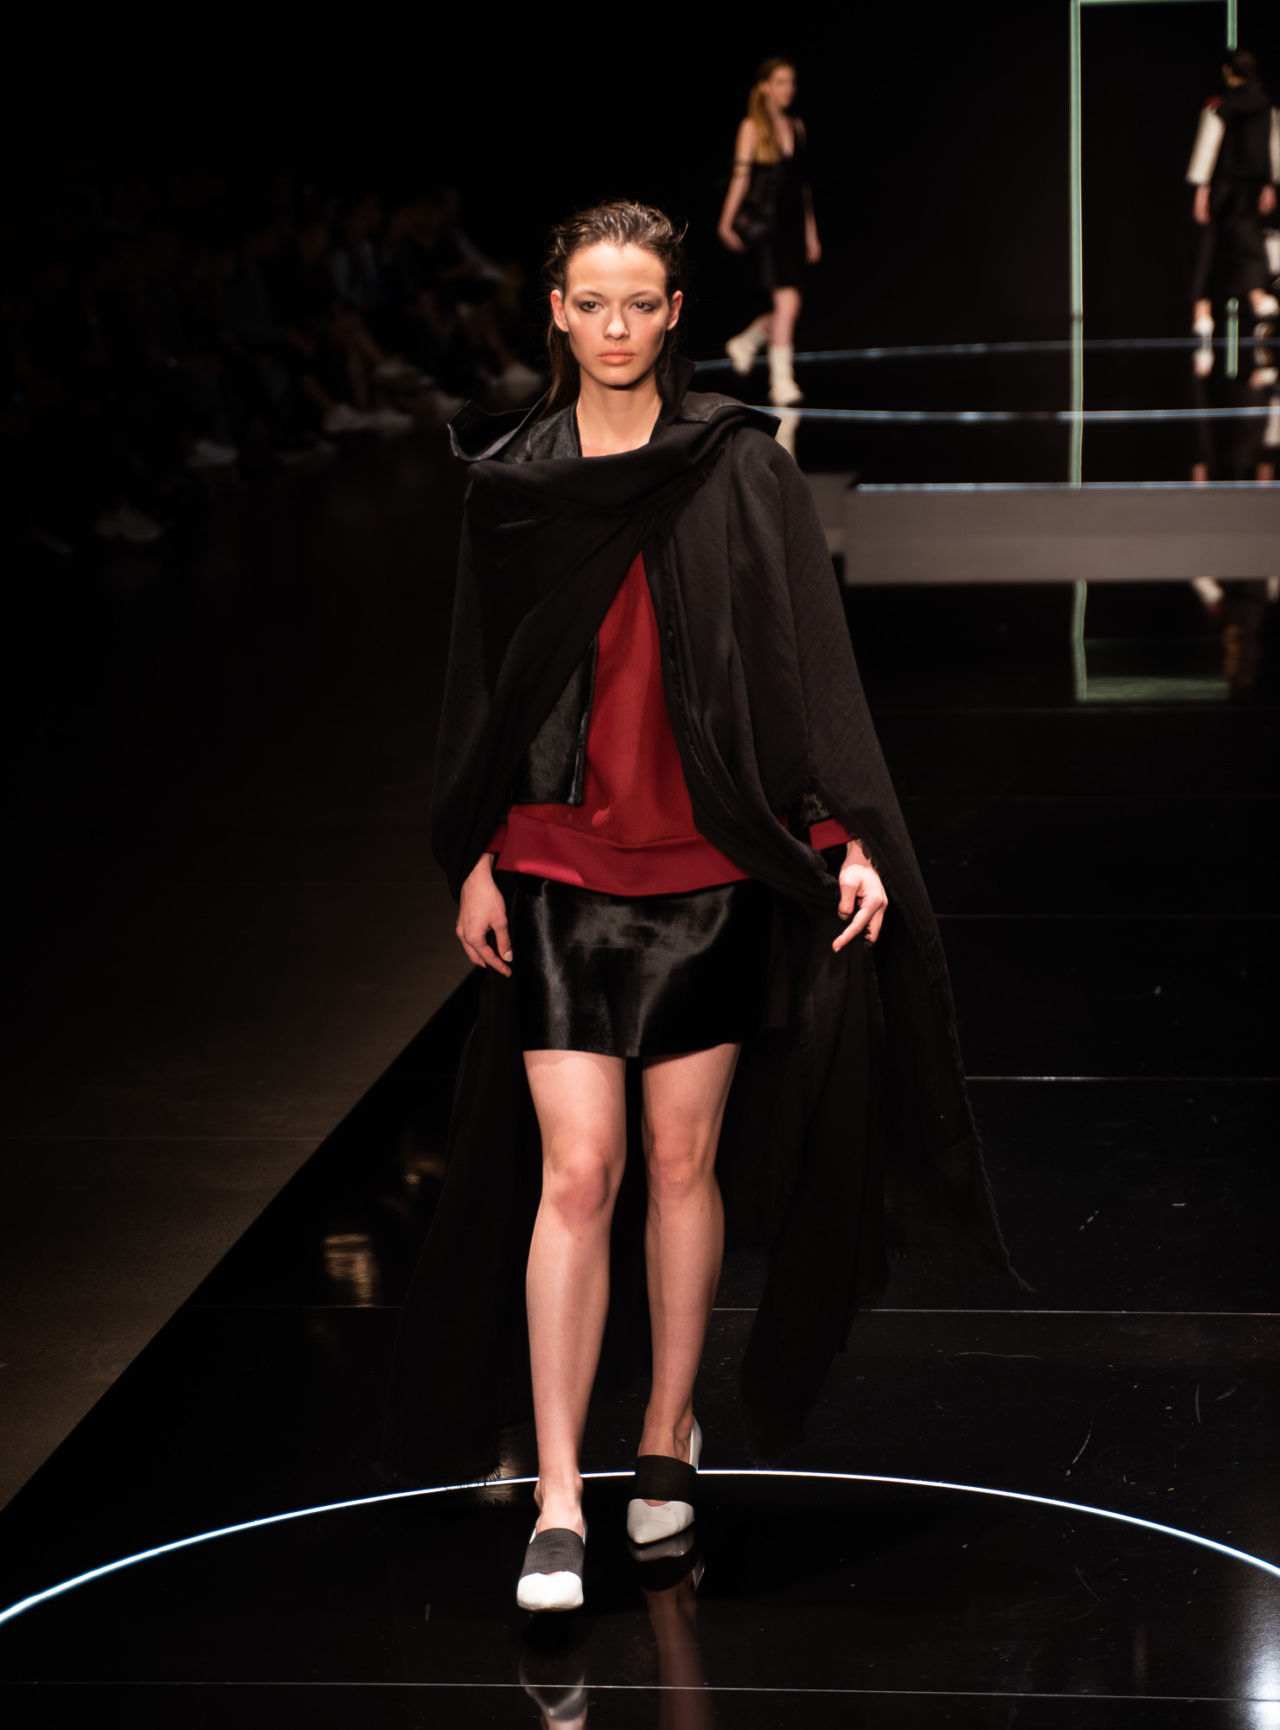 Designer Nubu